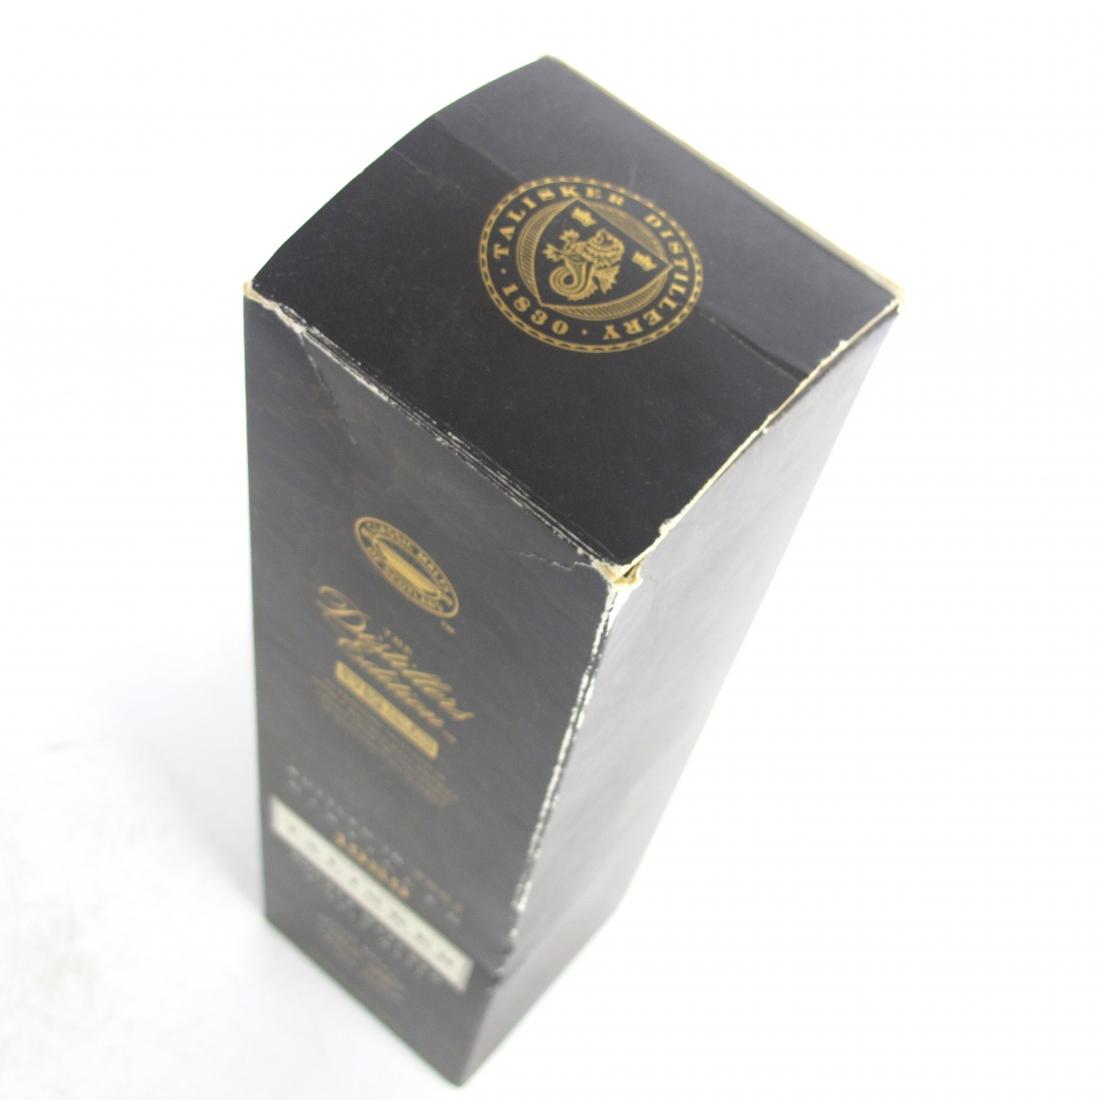 Talisker 1989 Distillers Edition